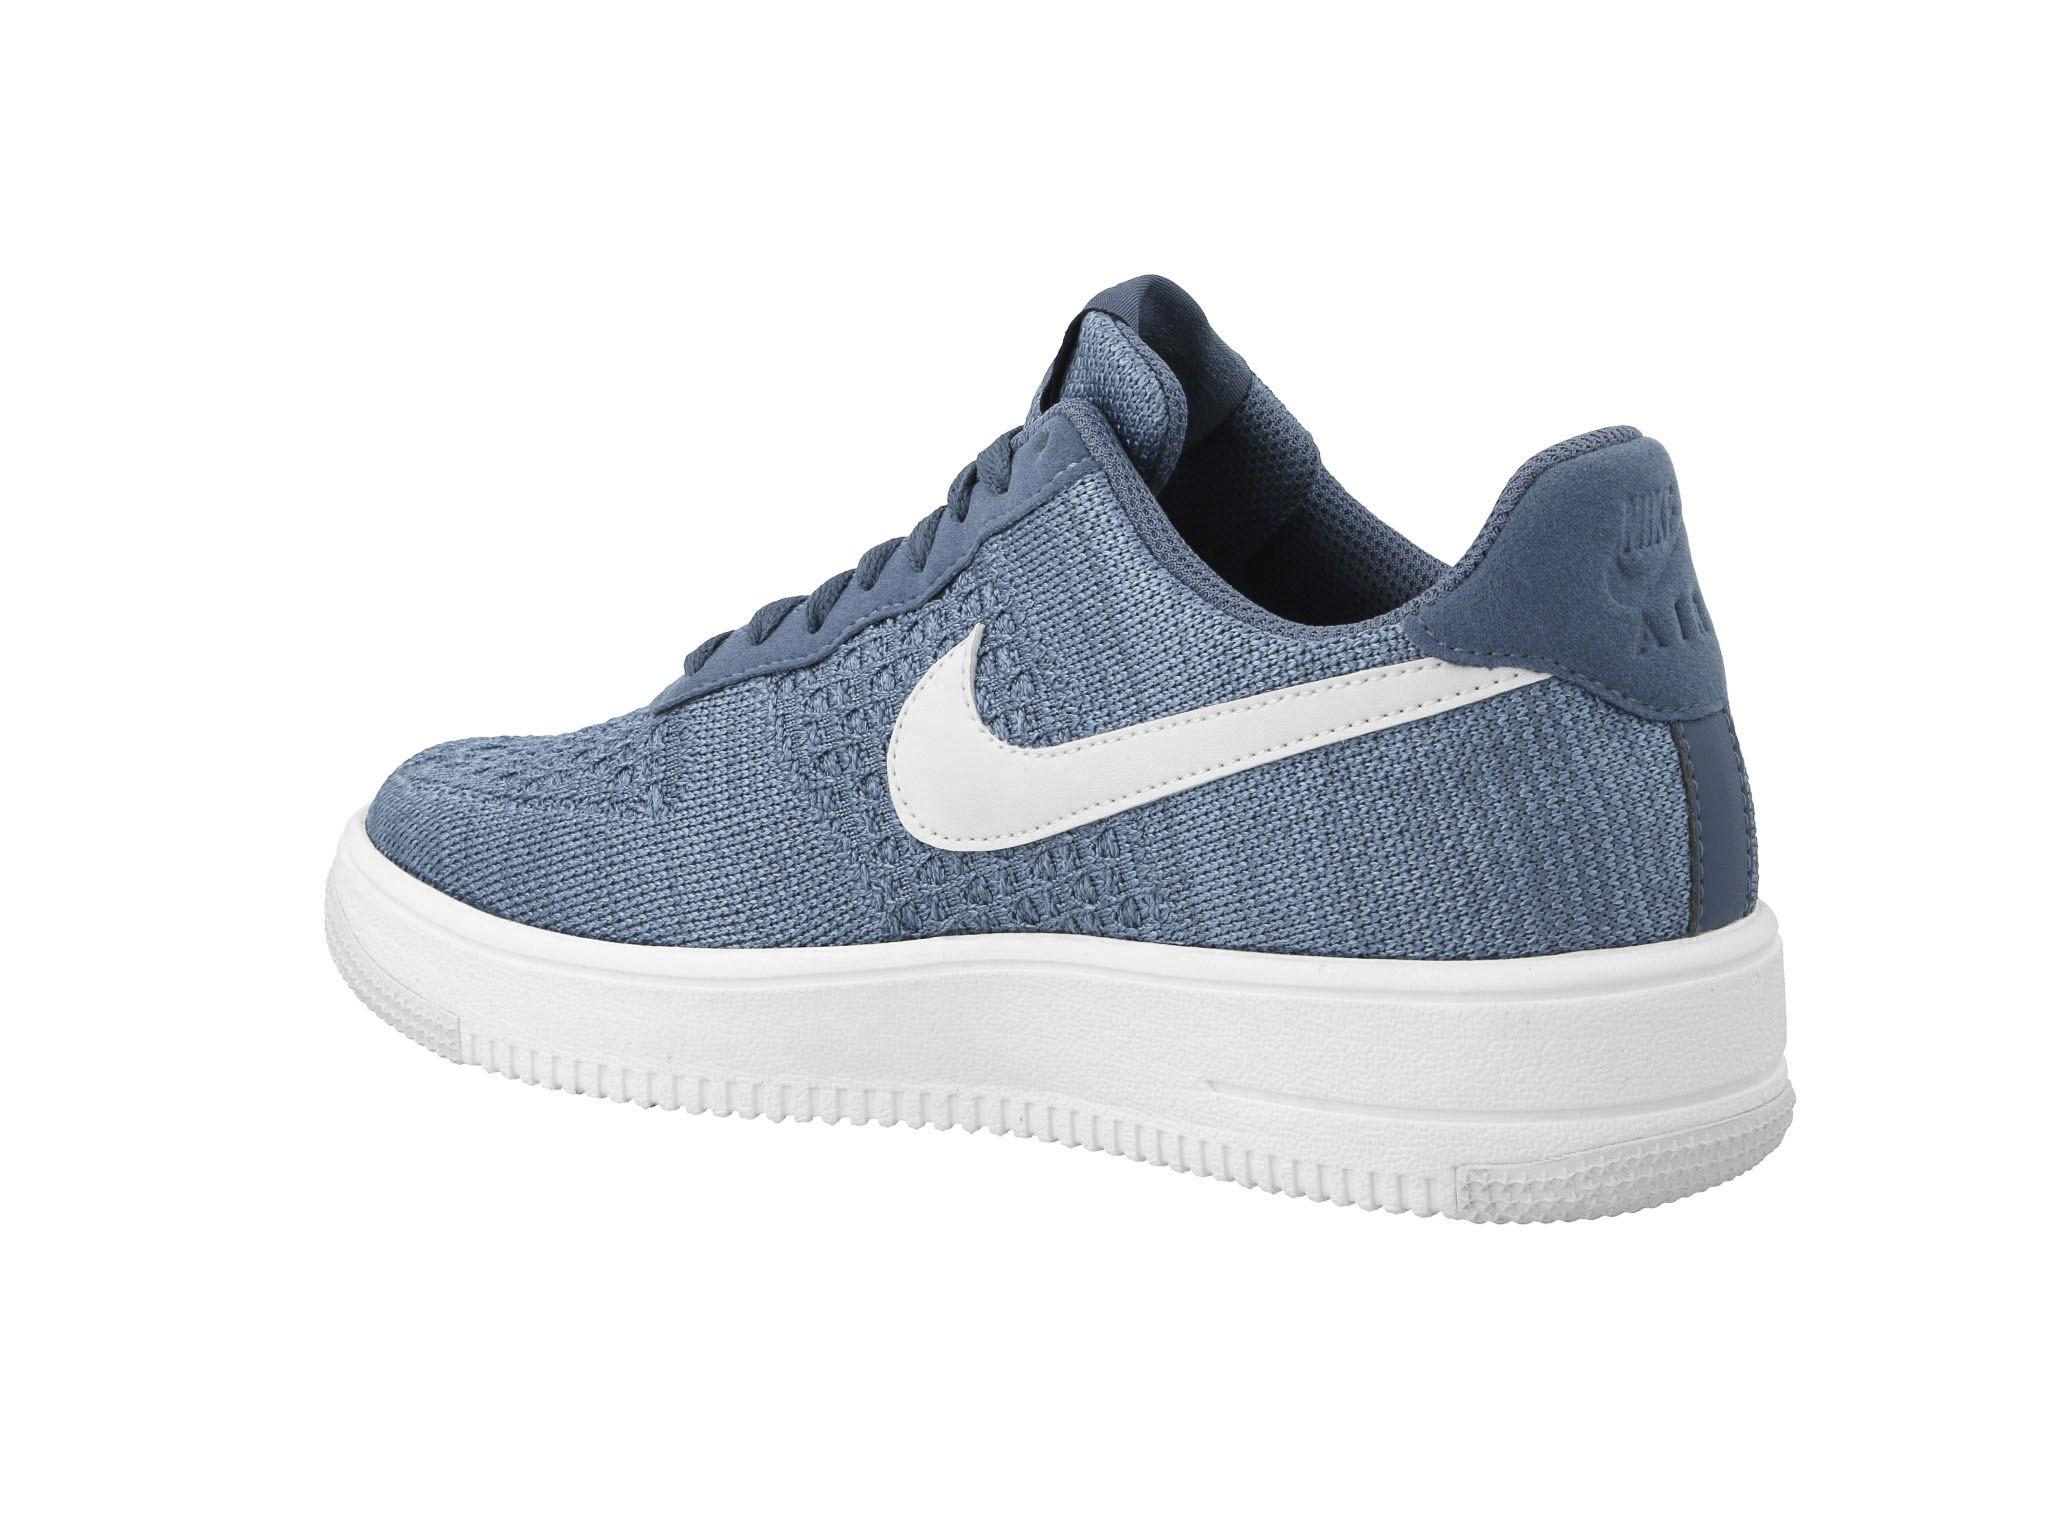 Shoes NIKE Air Force 1 Flyknit 2.0 CI0051 400 Ocean Fog